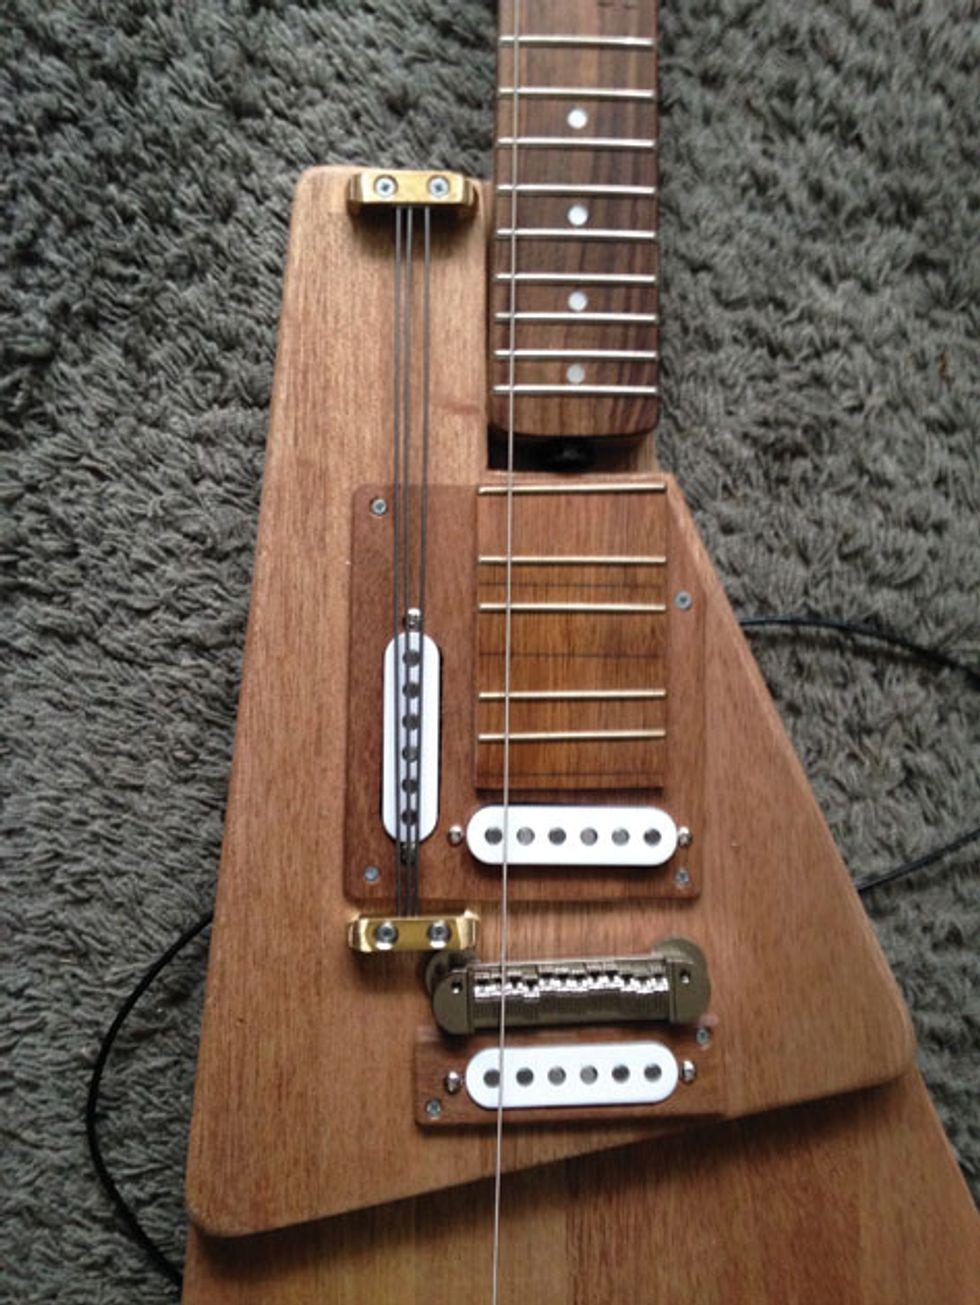 DIY: Thurston Moore's Drone Guitar Project | Premier Guitar